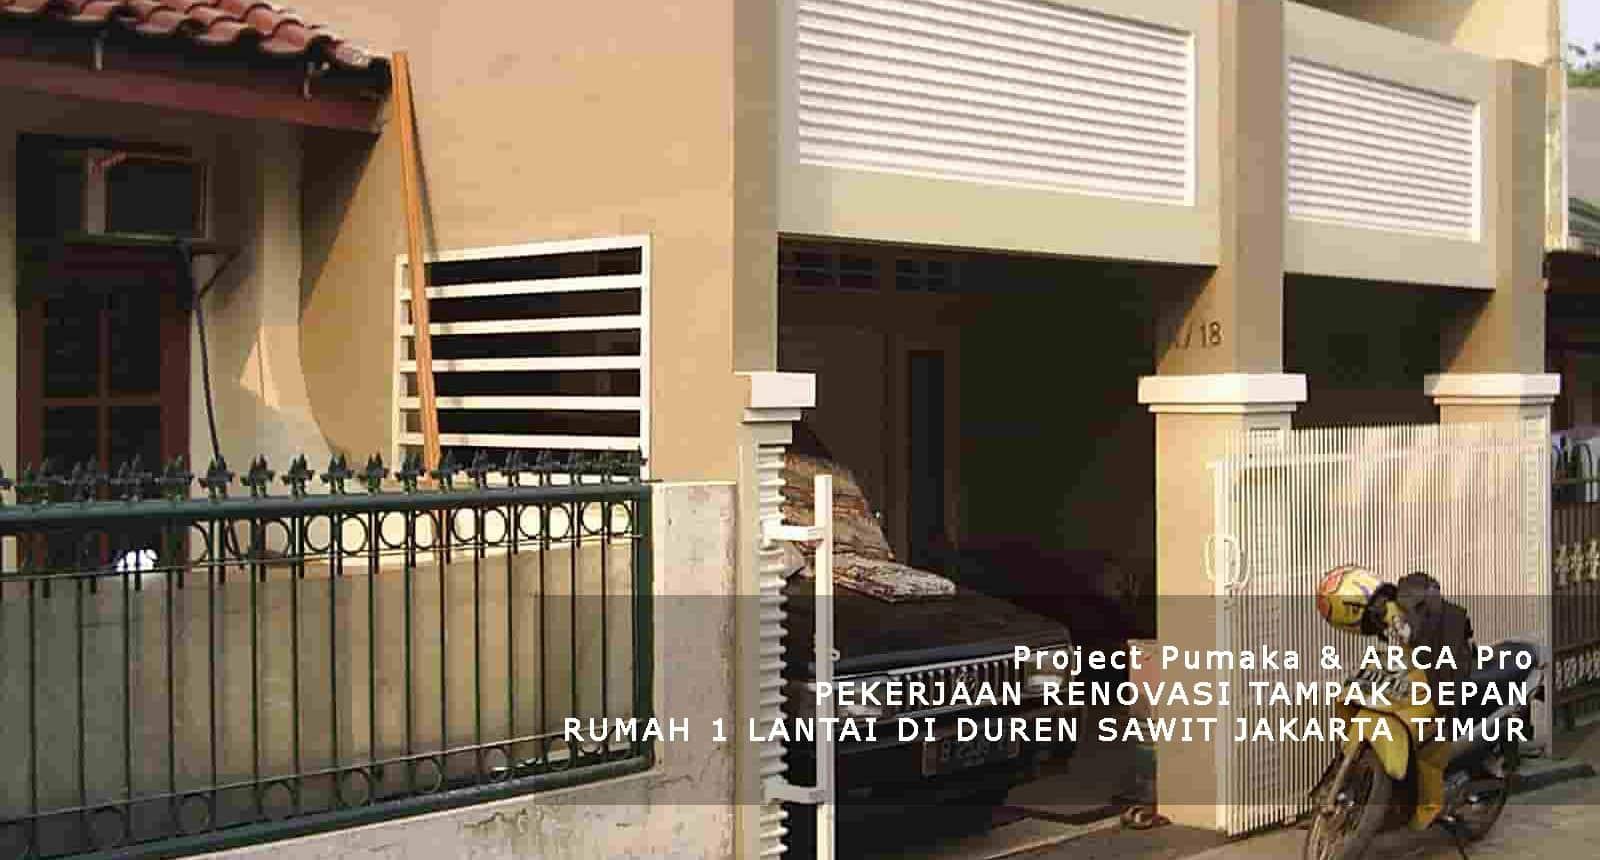 Jasa Kontraktor Rumah, Jasa Arsitektur Rumah Jakarta Utara